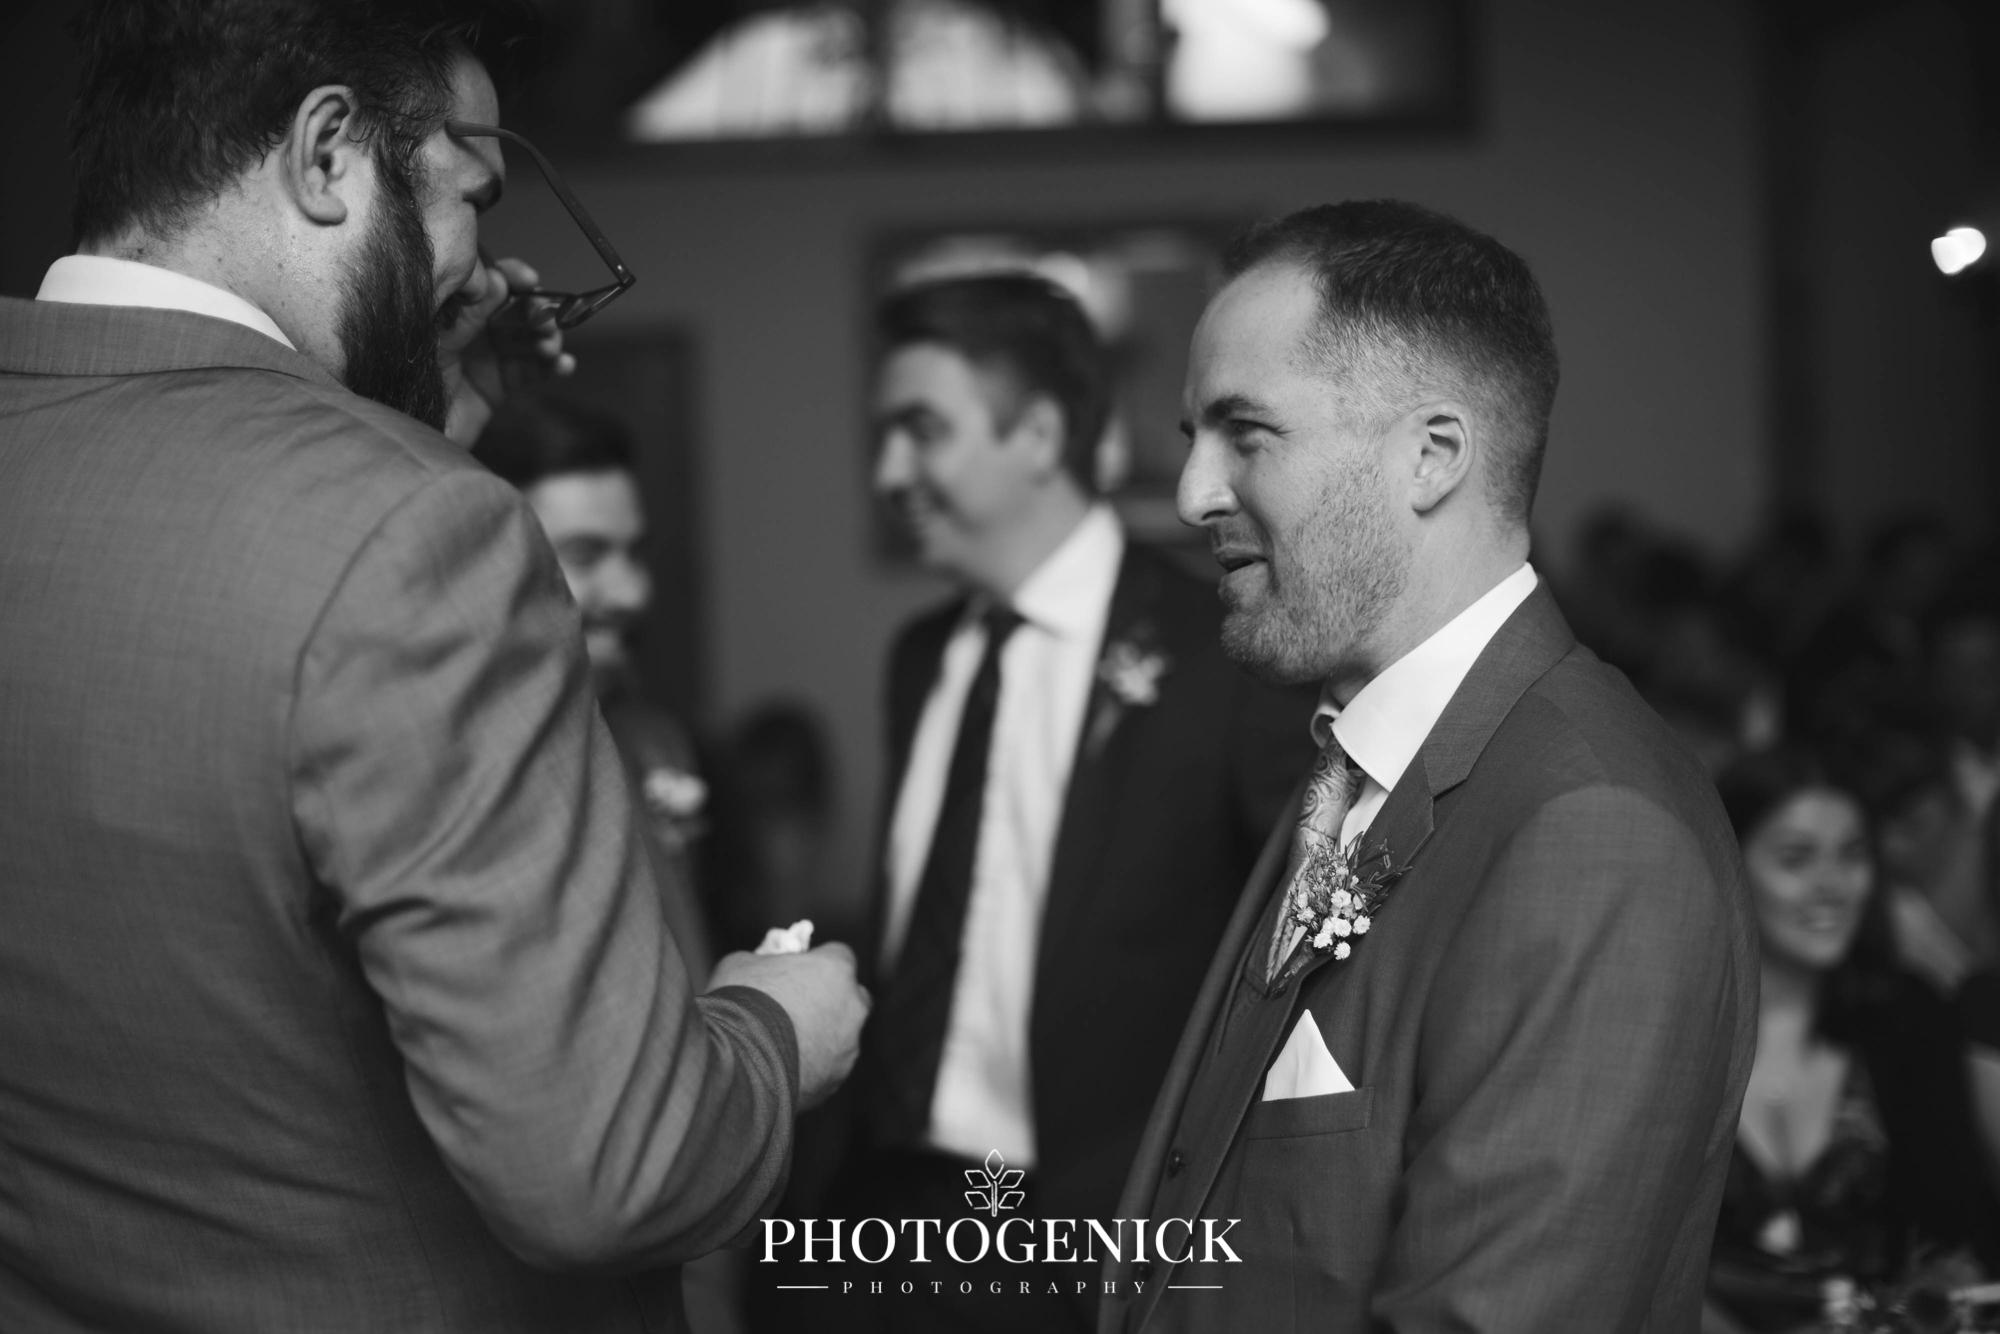 oldwalls gower wedding photographers-19.jpg